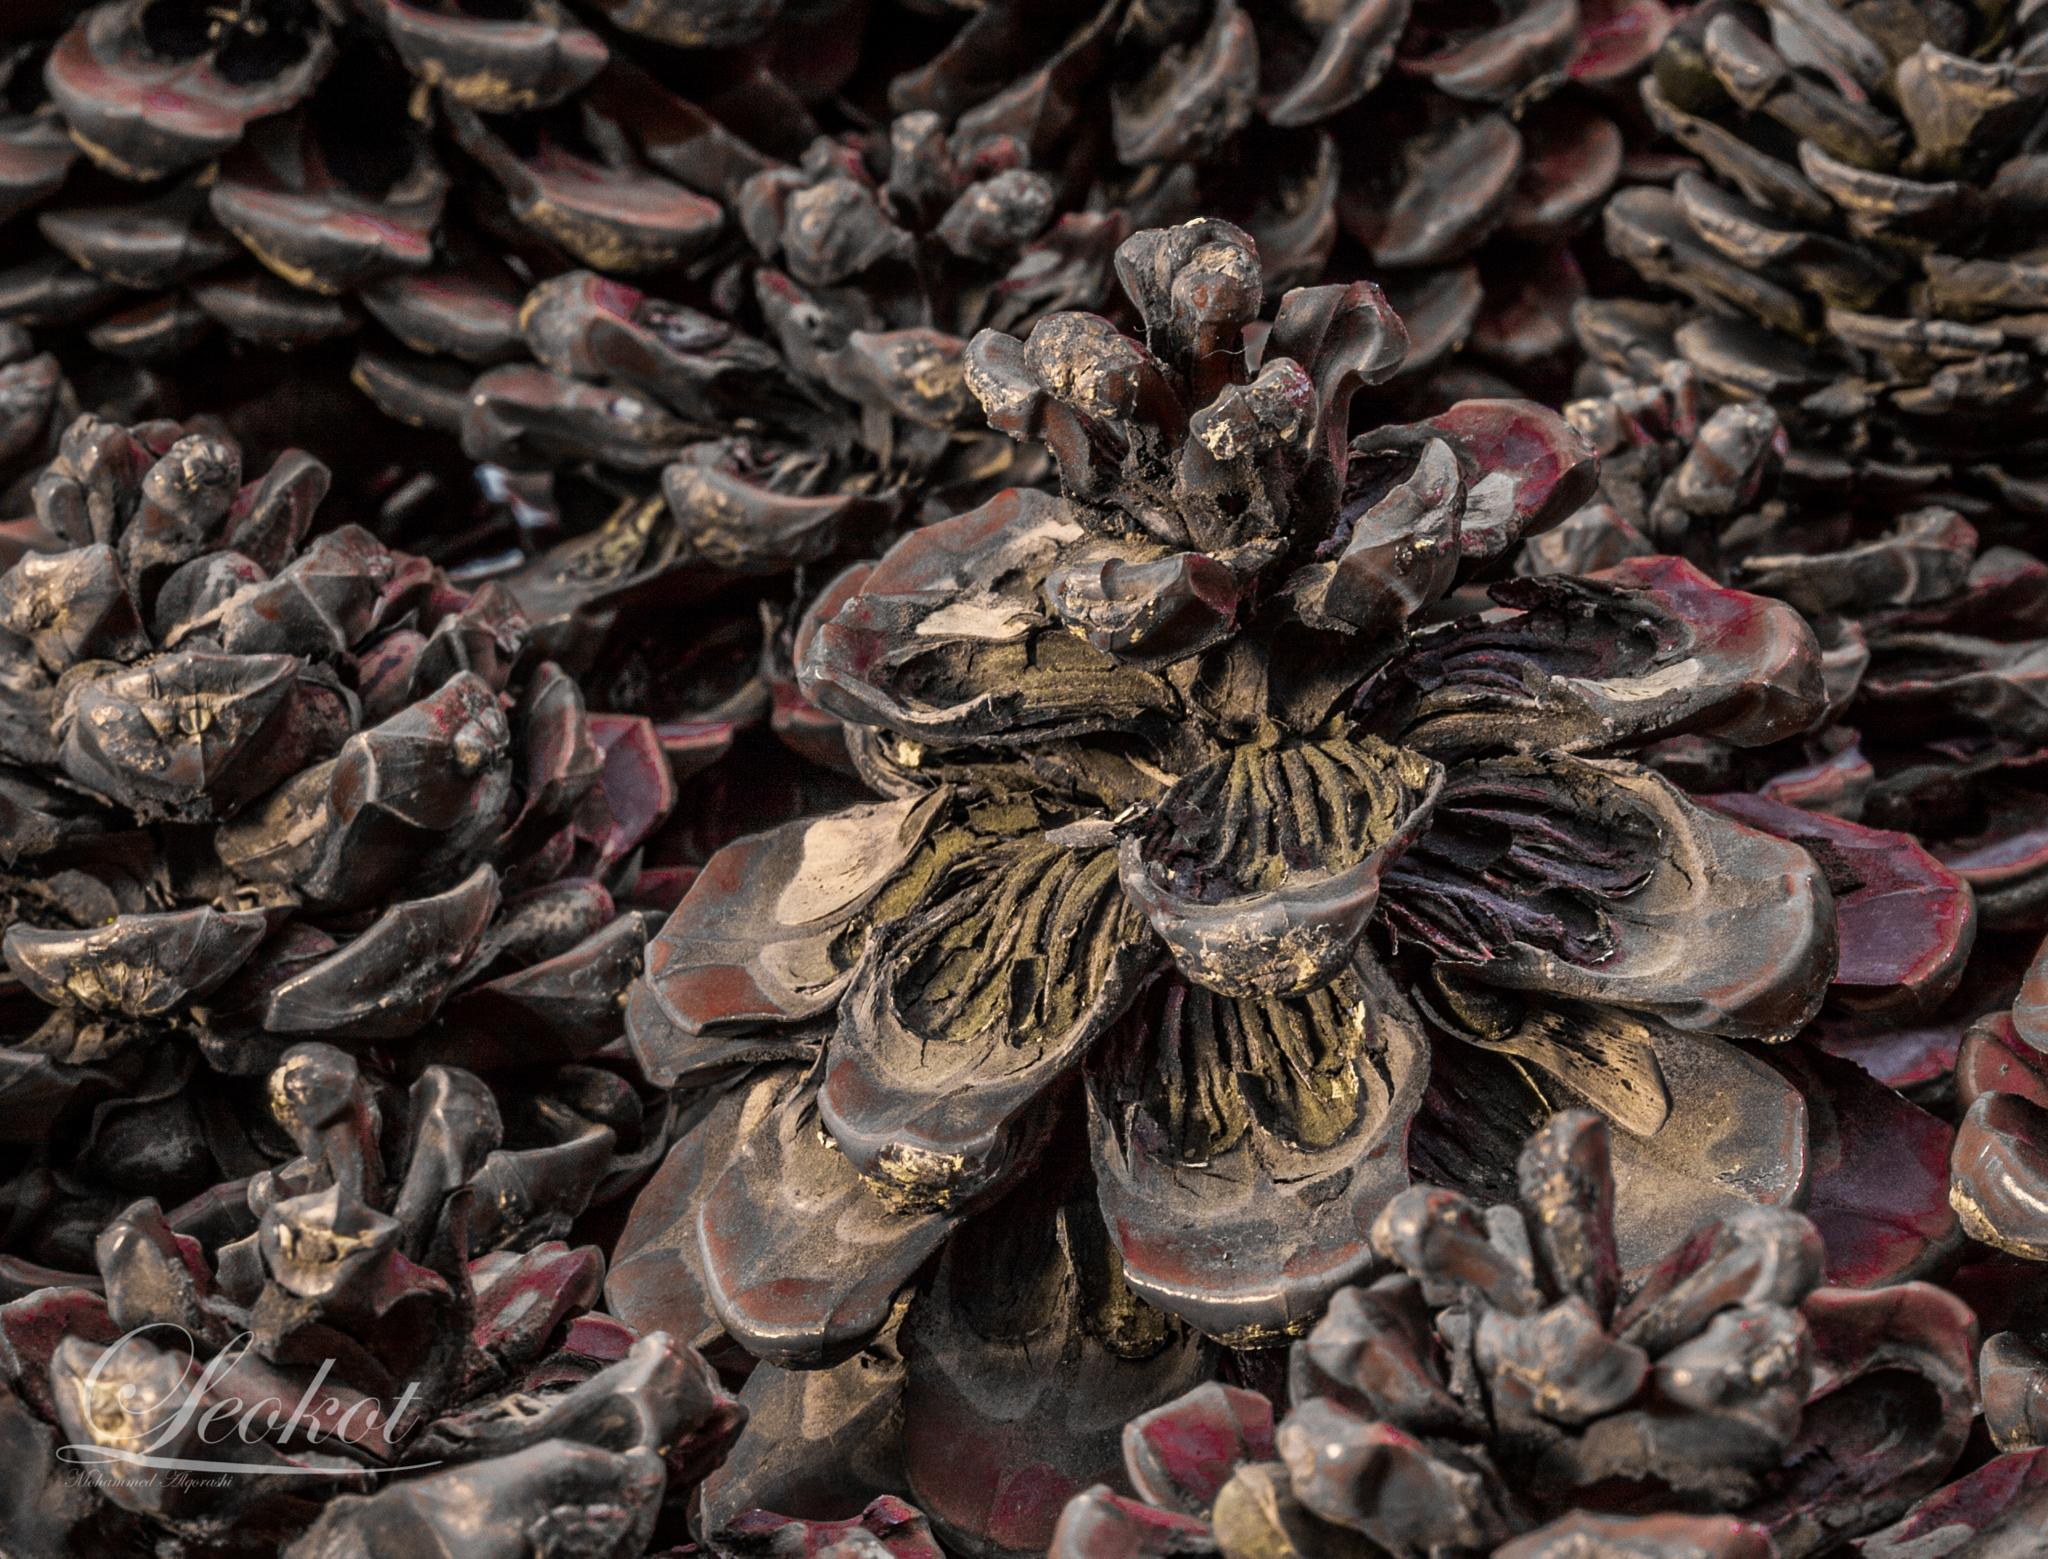 Beautifully Dry  by Mohammed Alqorashi